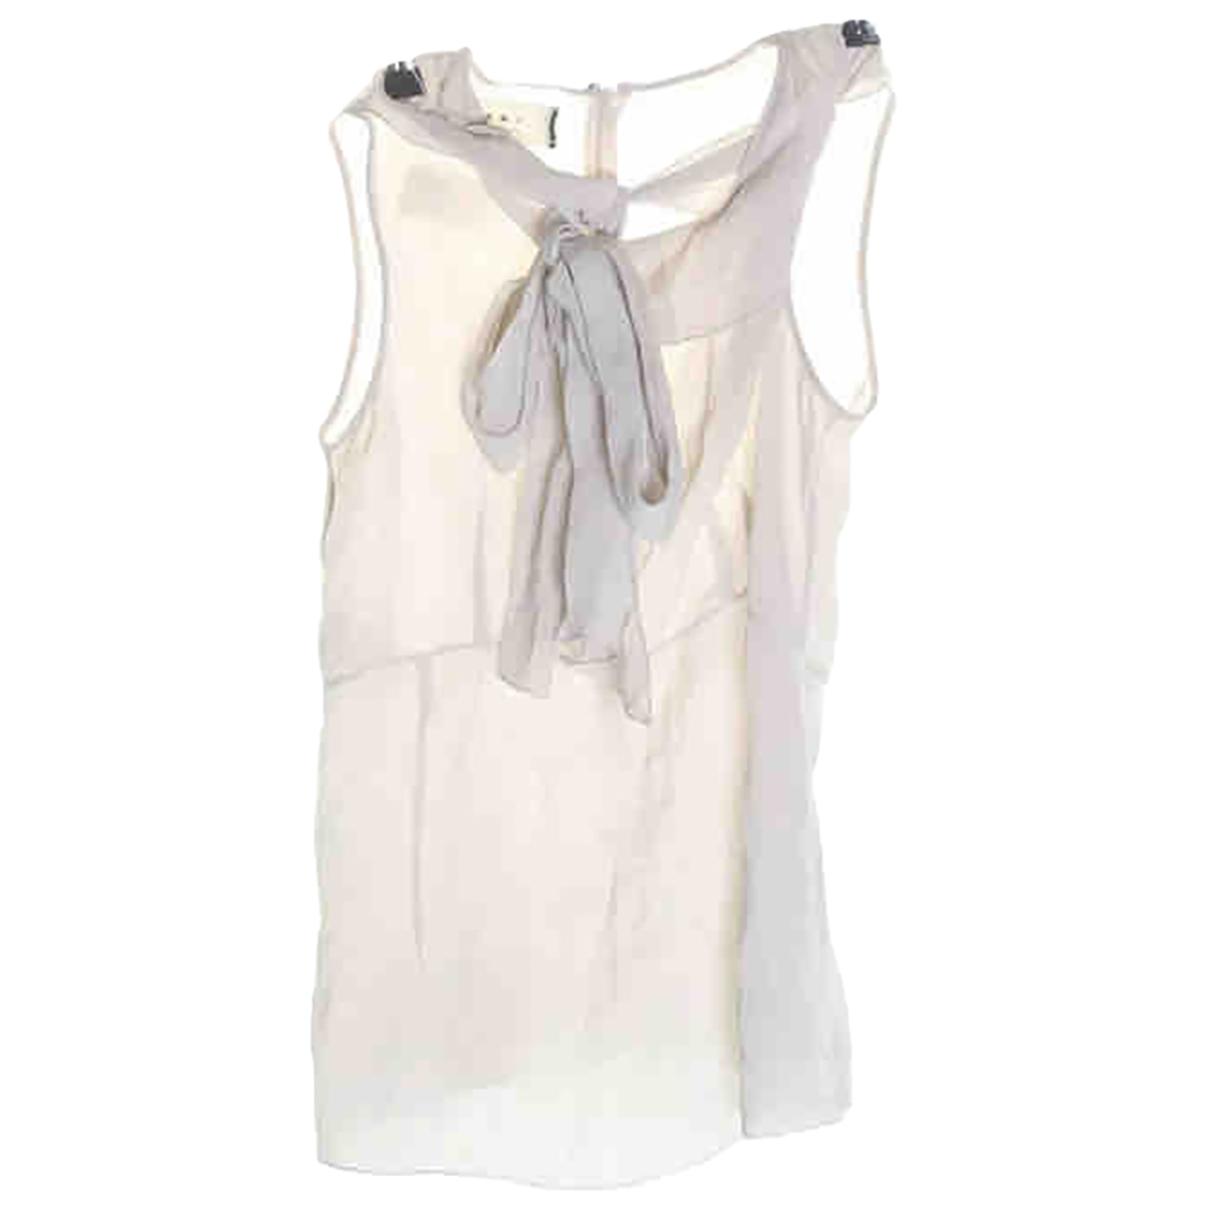 Marni \N Beige Linen  top for Women S International